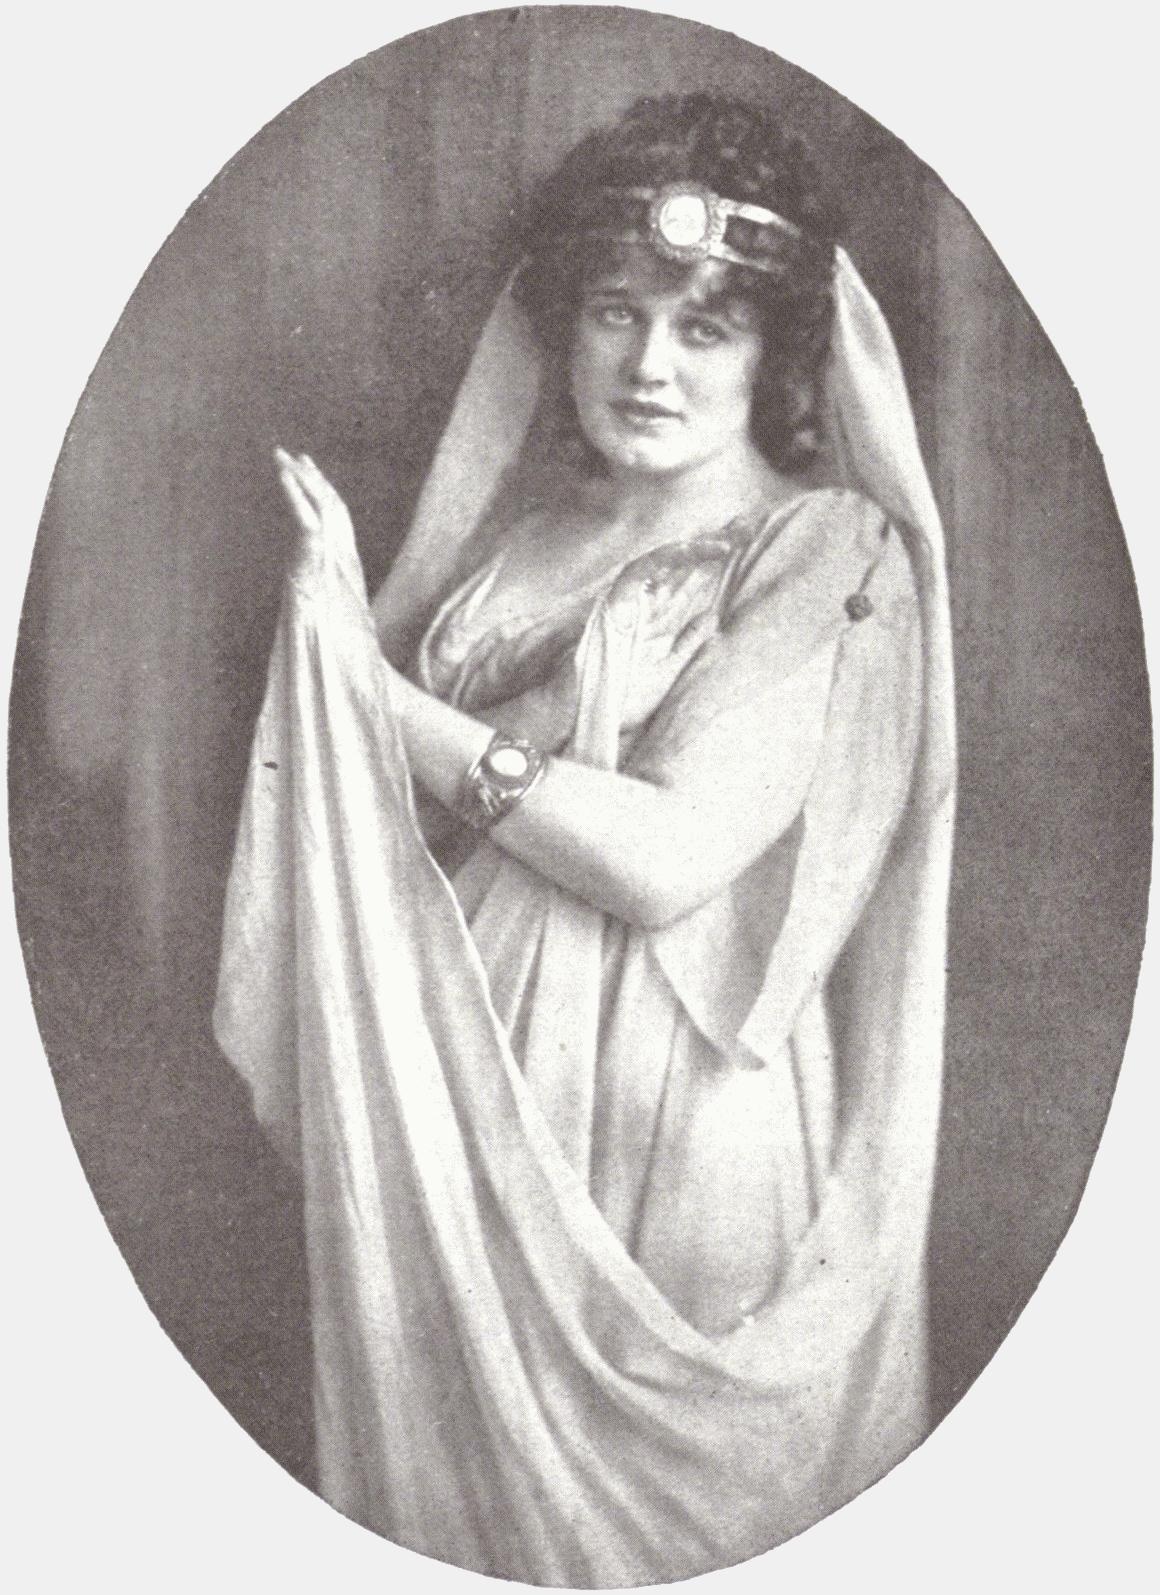 Jeritza als Ariadne 1917, Franz X. Setzer